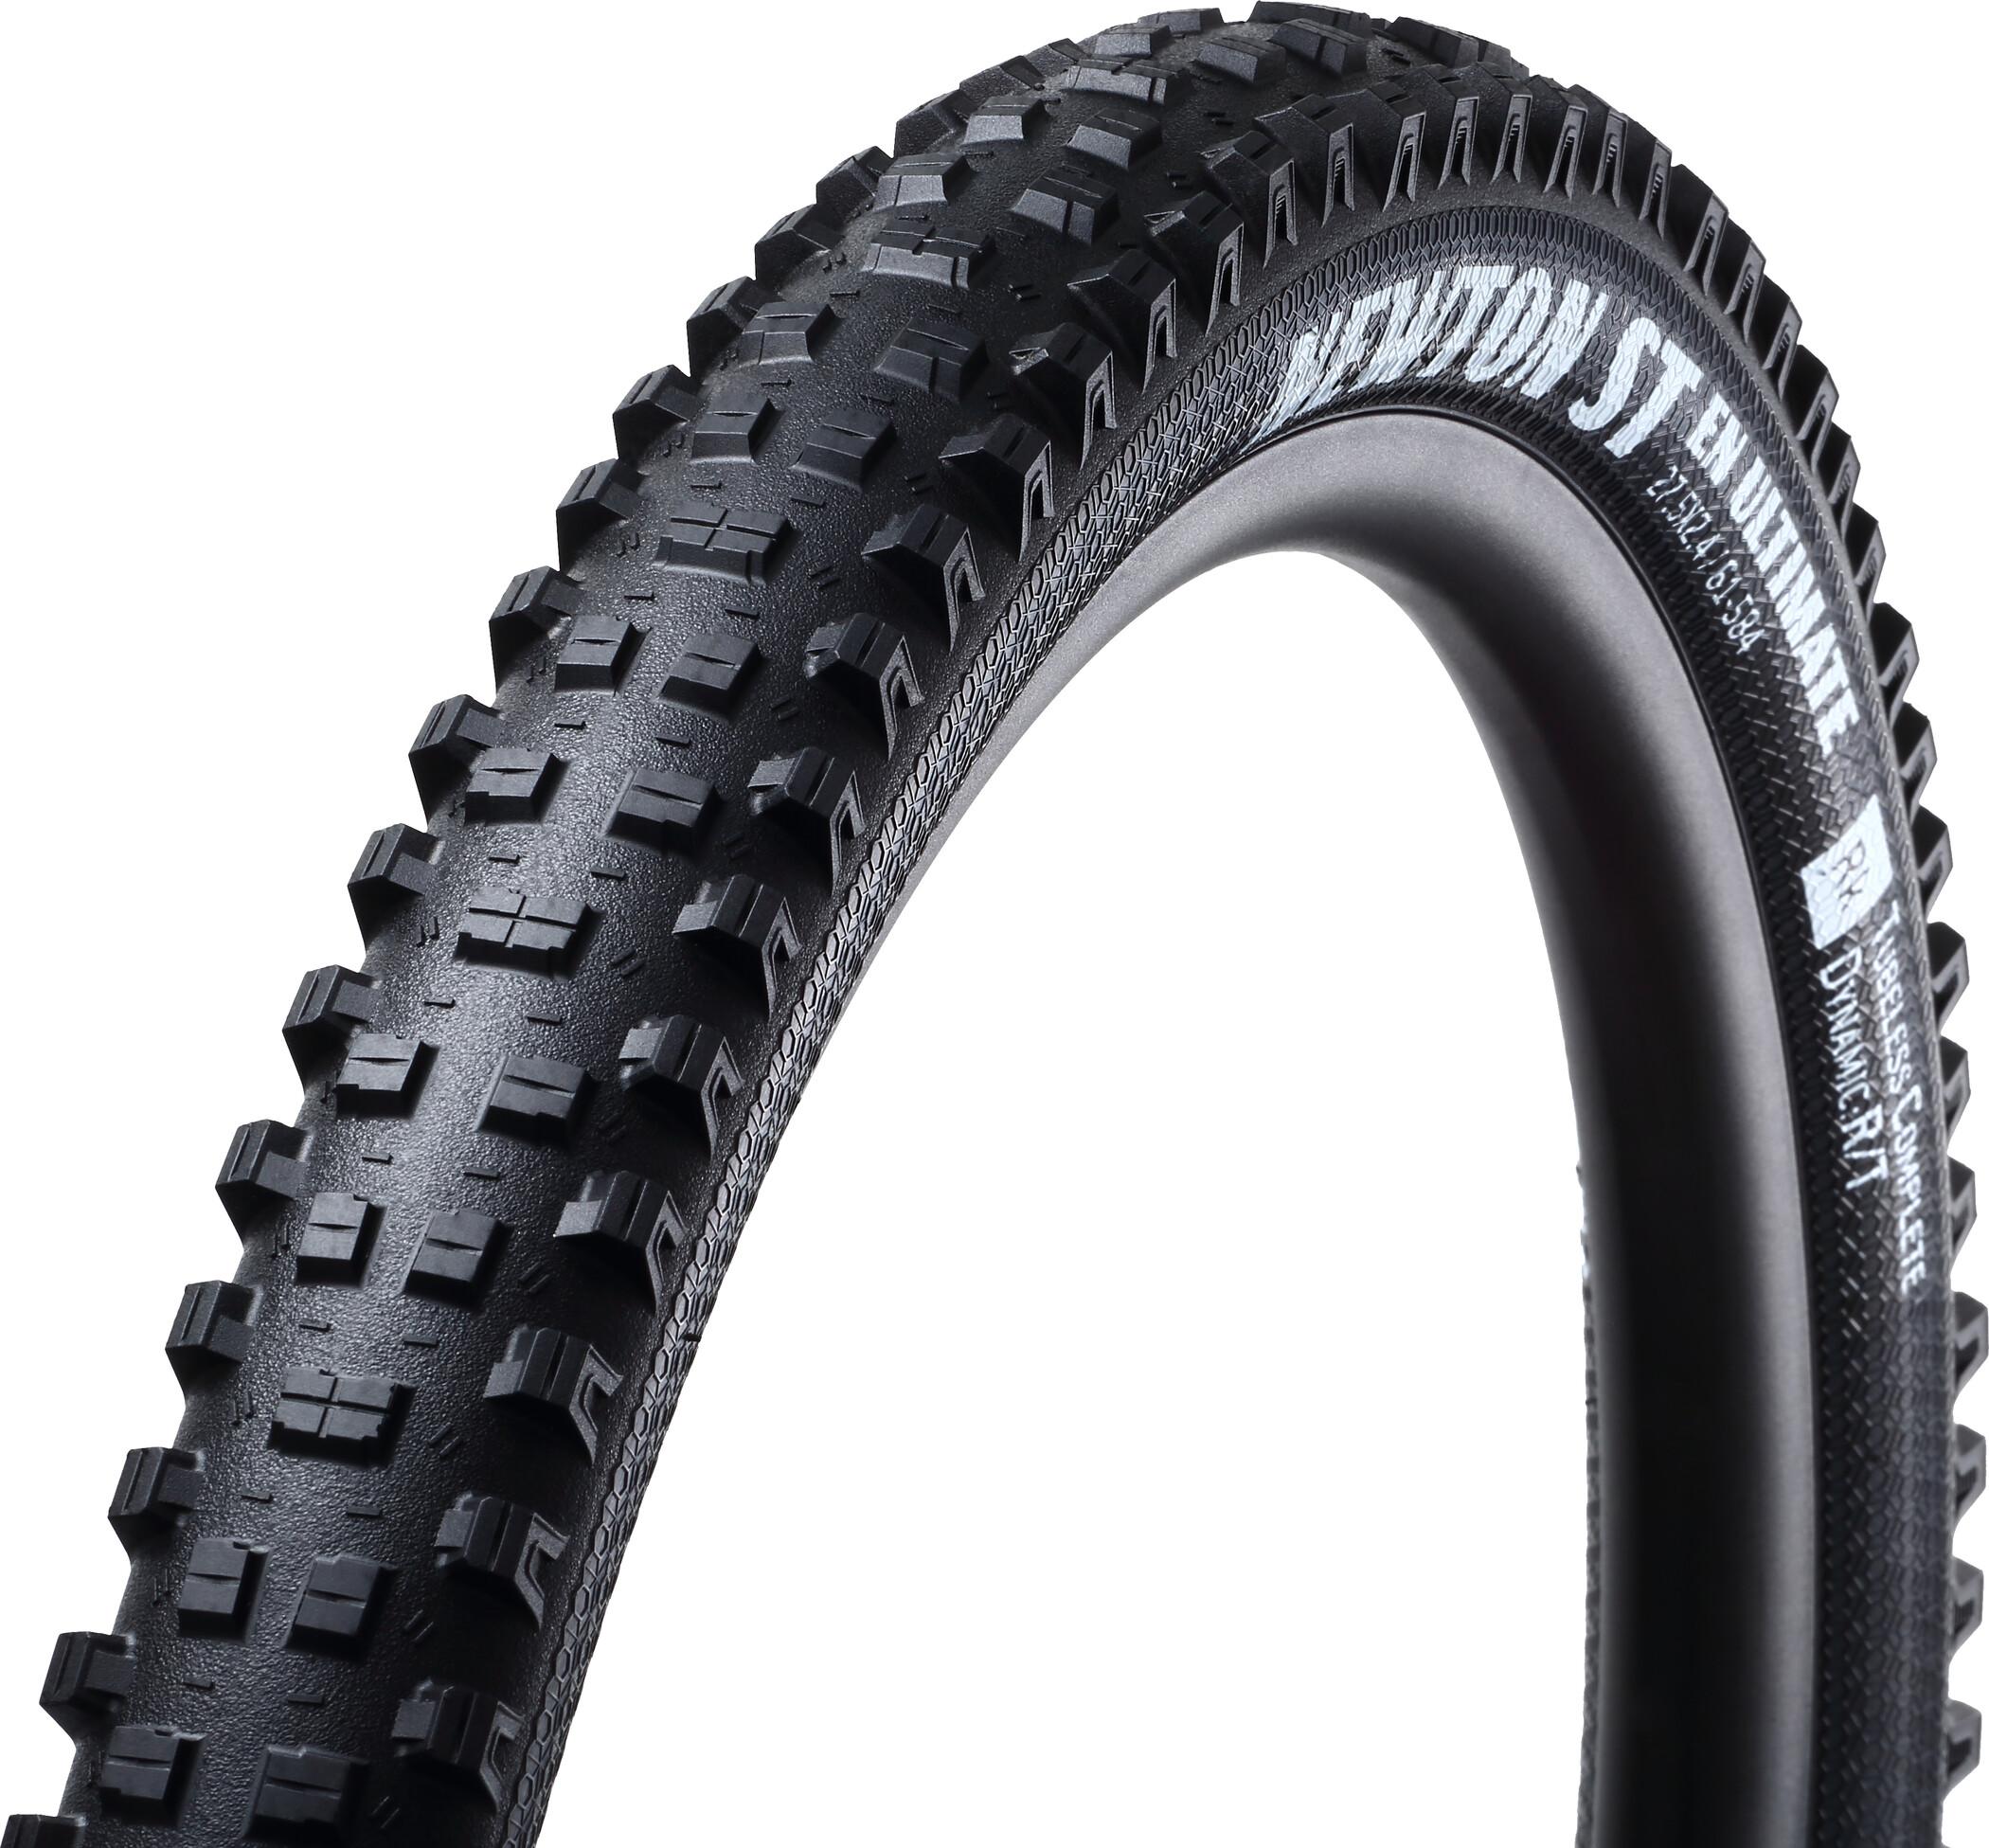 Goodyear Newton-ST EN Premium Foldedæk 61-622 Tubeless Complete Dynamic R/T e25, black (2019)   Tyres